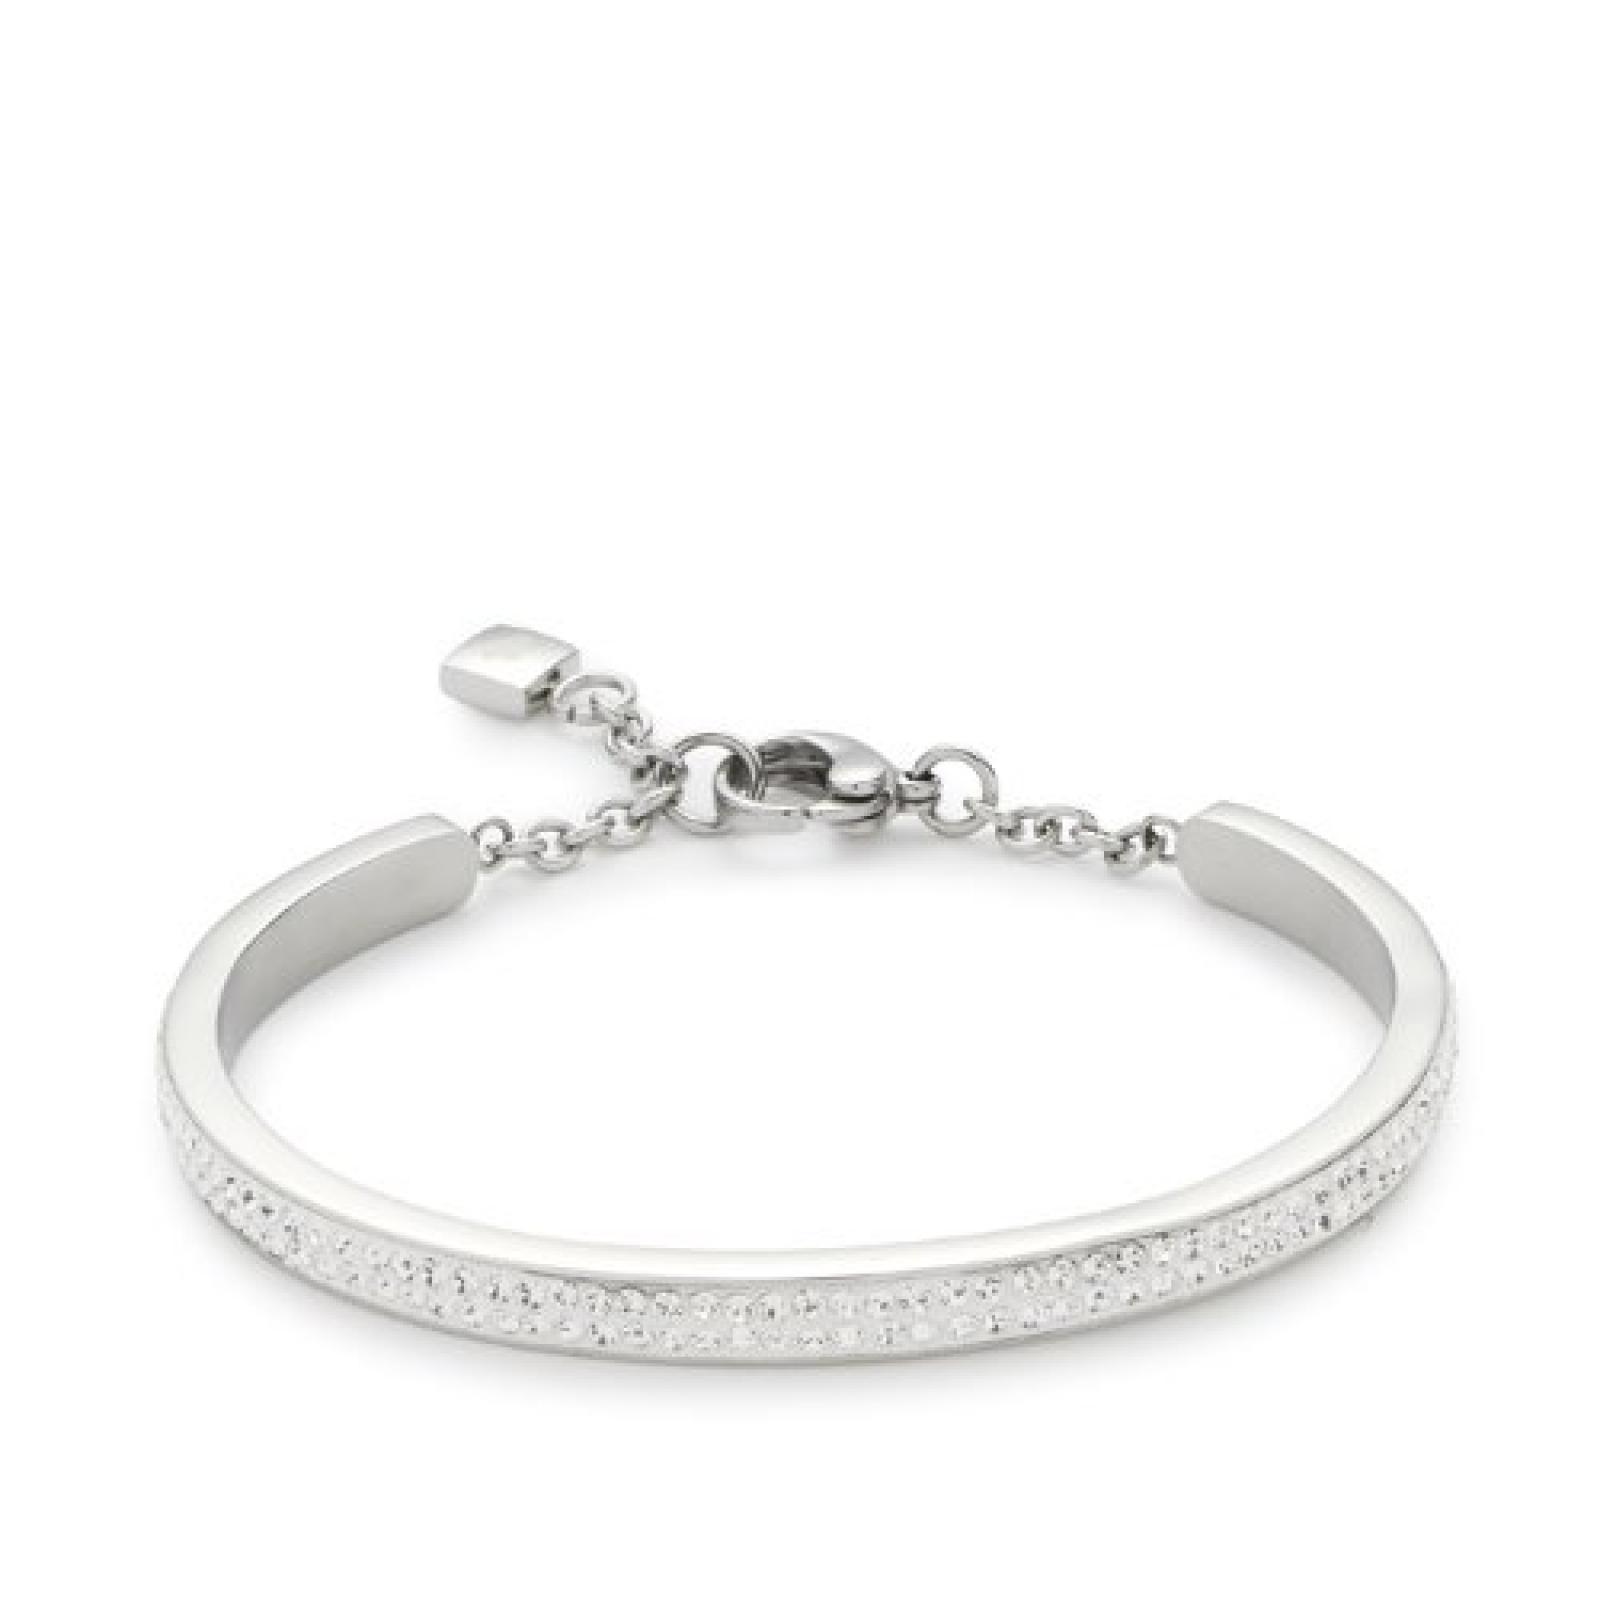 Leonardo Jewels Damen-Armreif Edelstahl Glas Brillante 015162